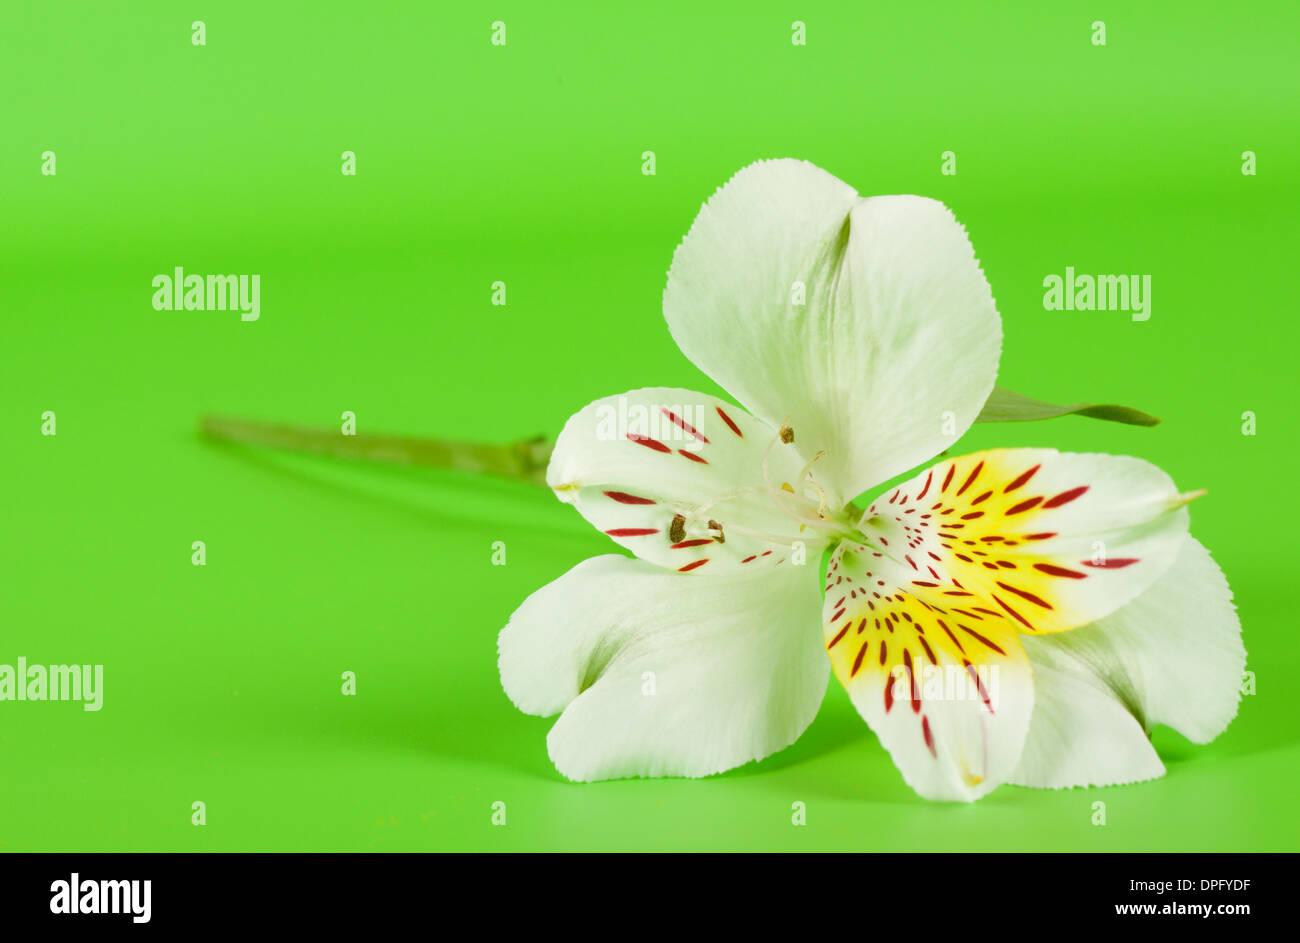 White alstroemeria flower on a stalk with green background stock white alstroemeria flower on a stalk with green background mightylinksfo